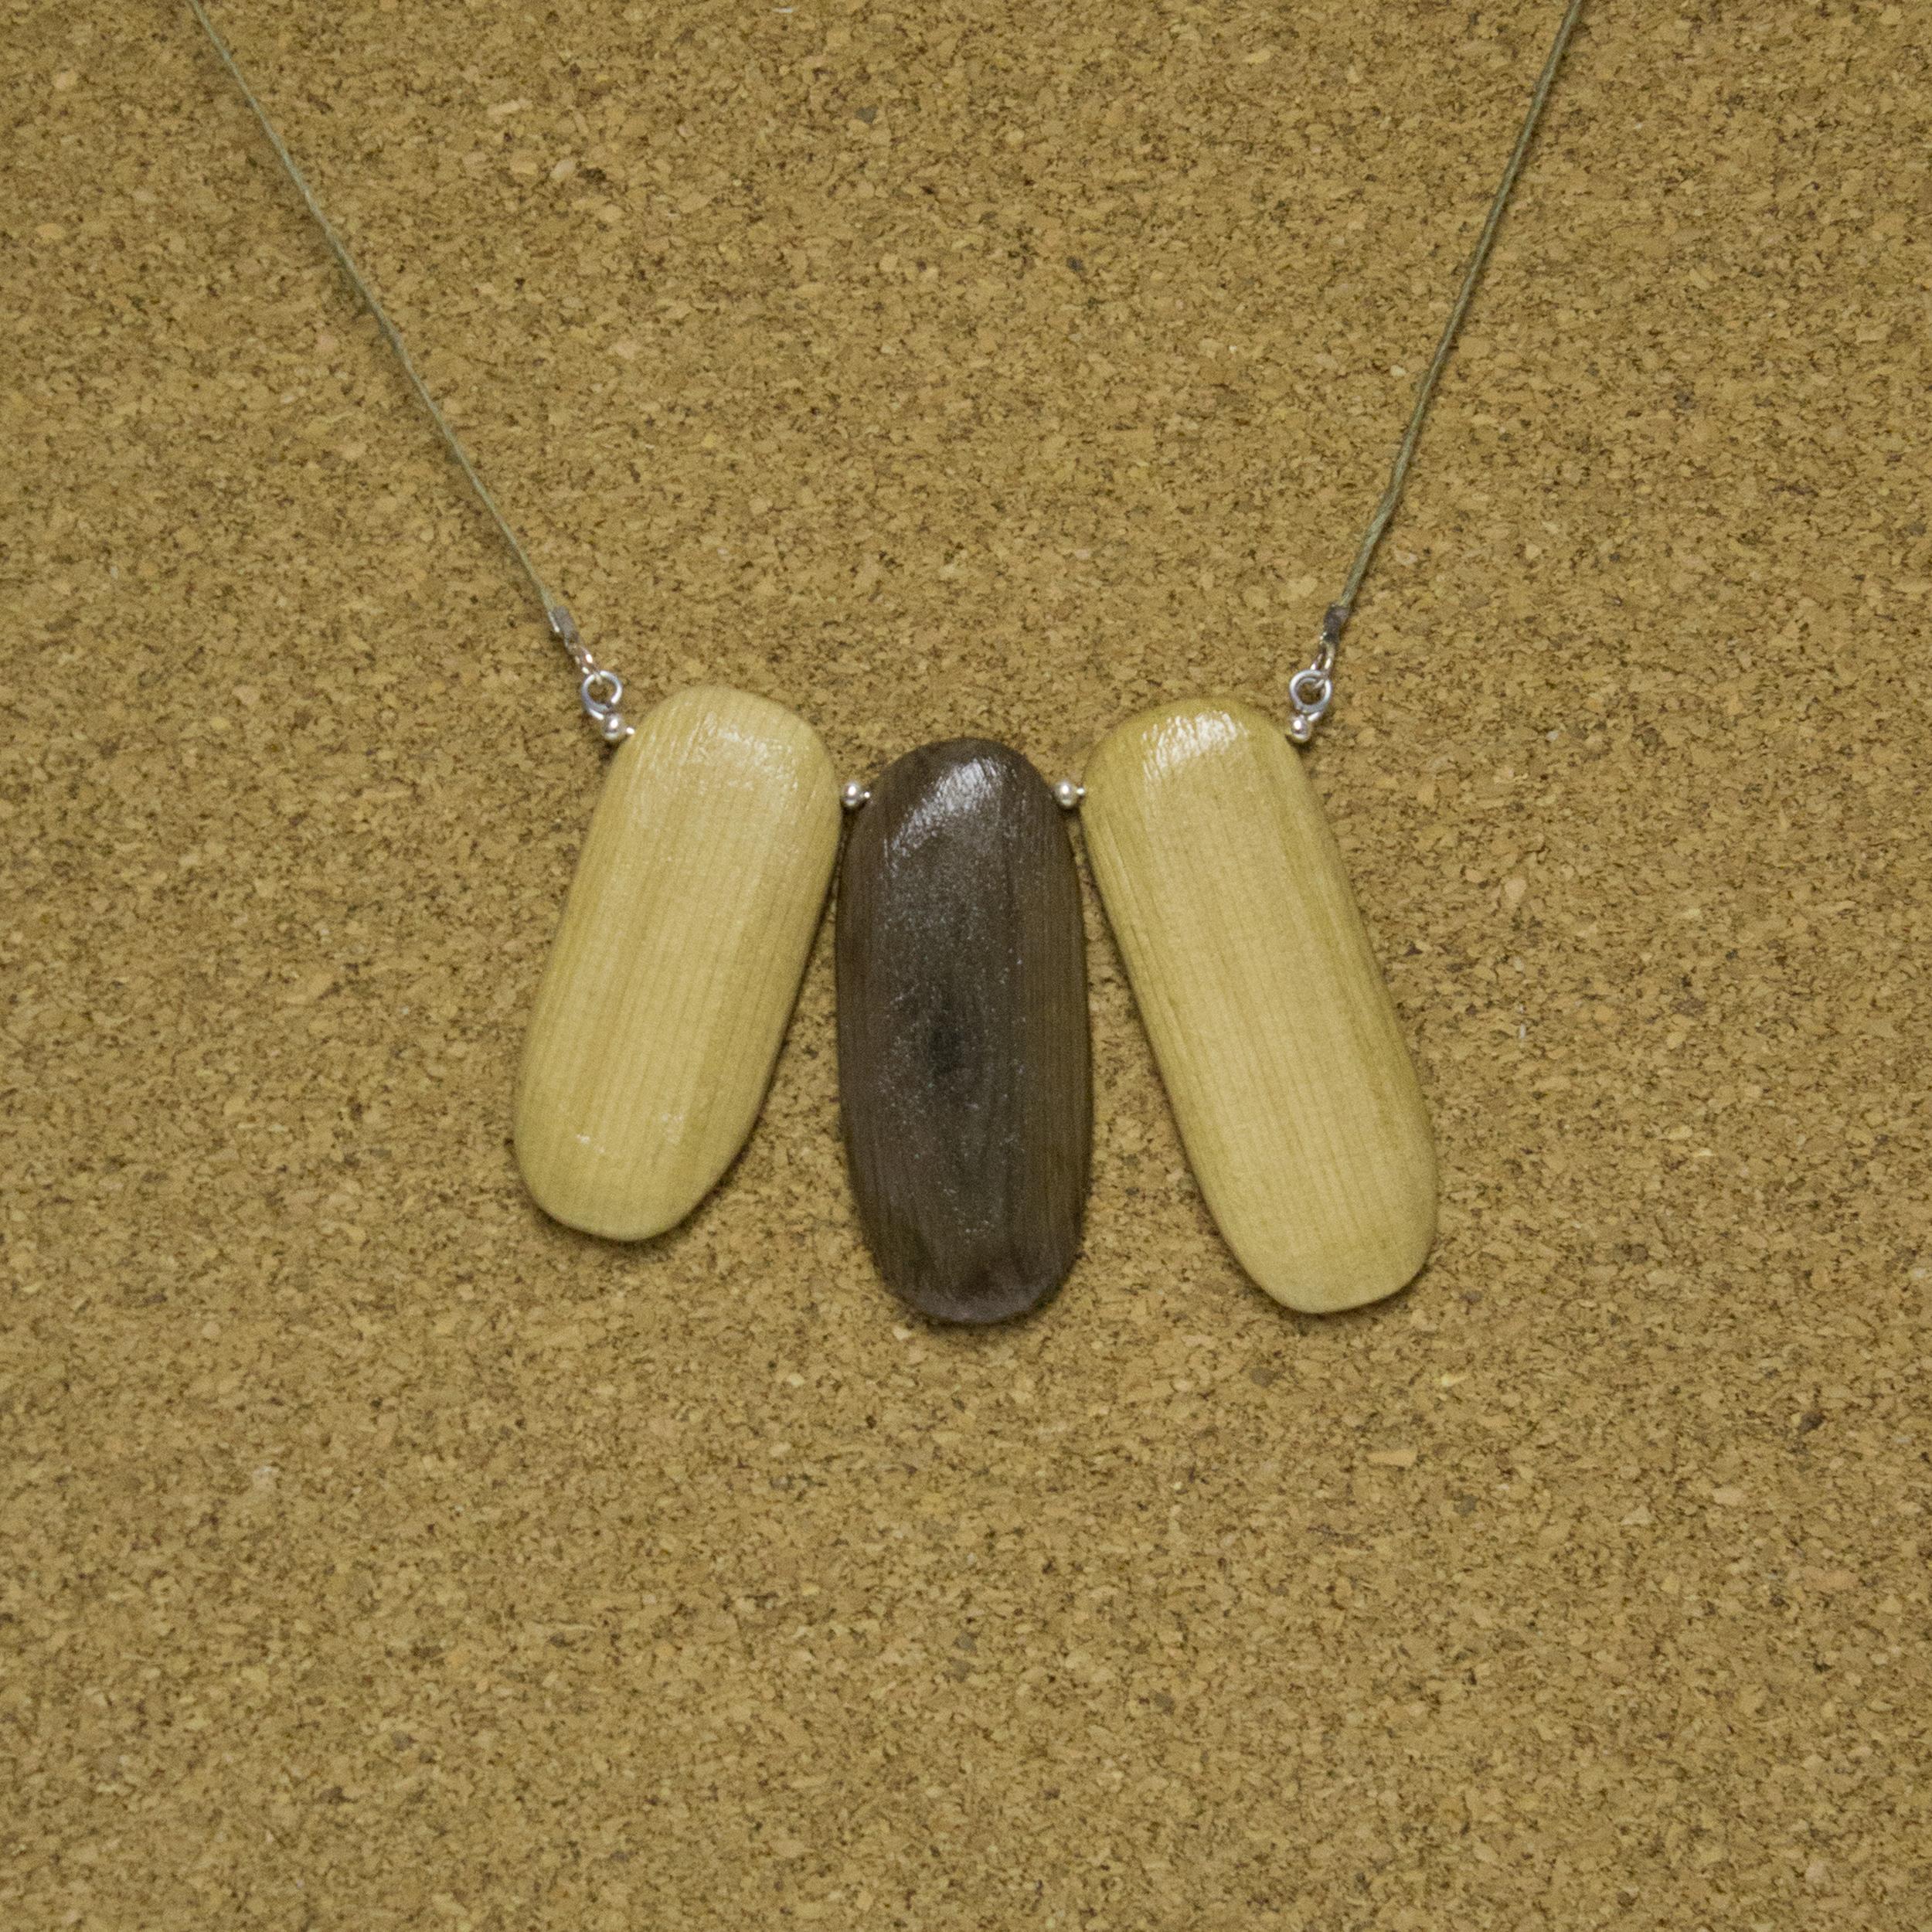 Asymmetrical Wood Stones - $15